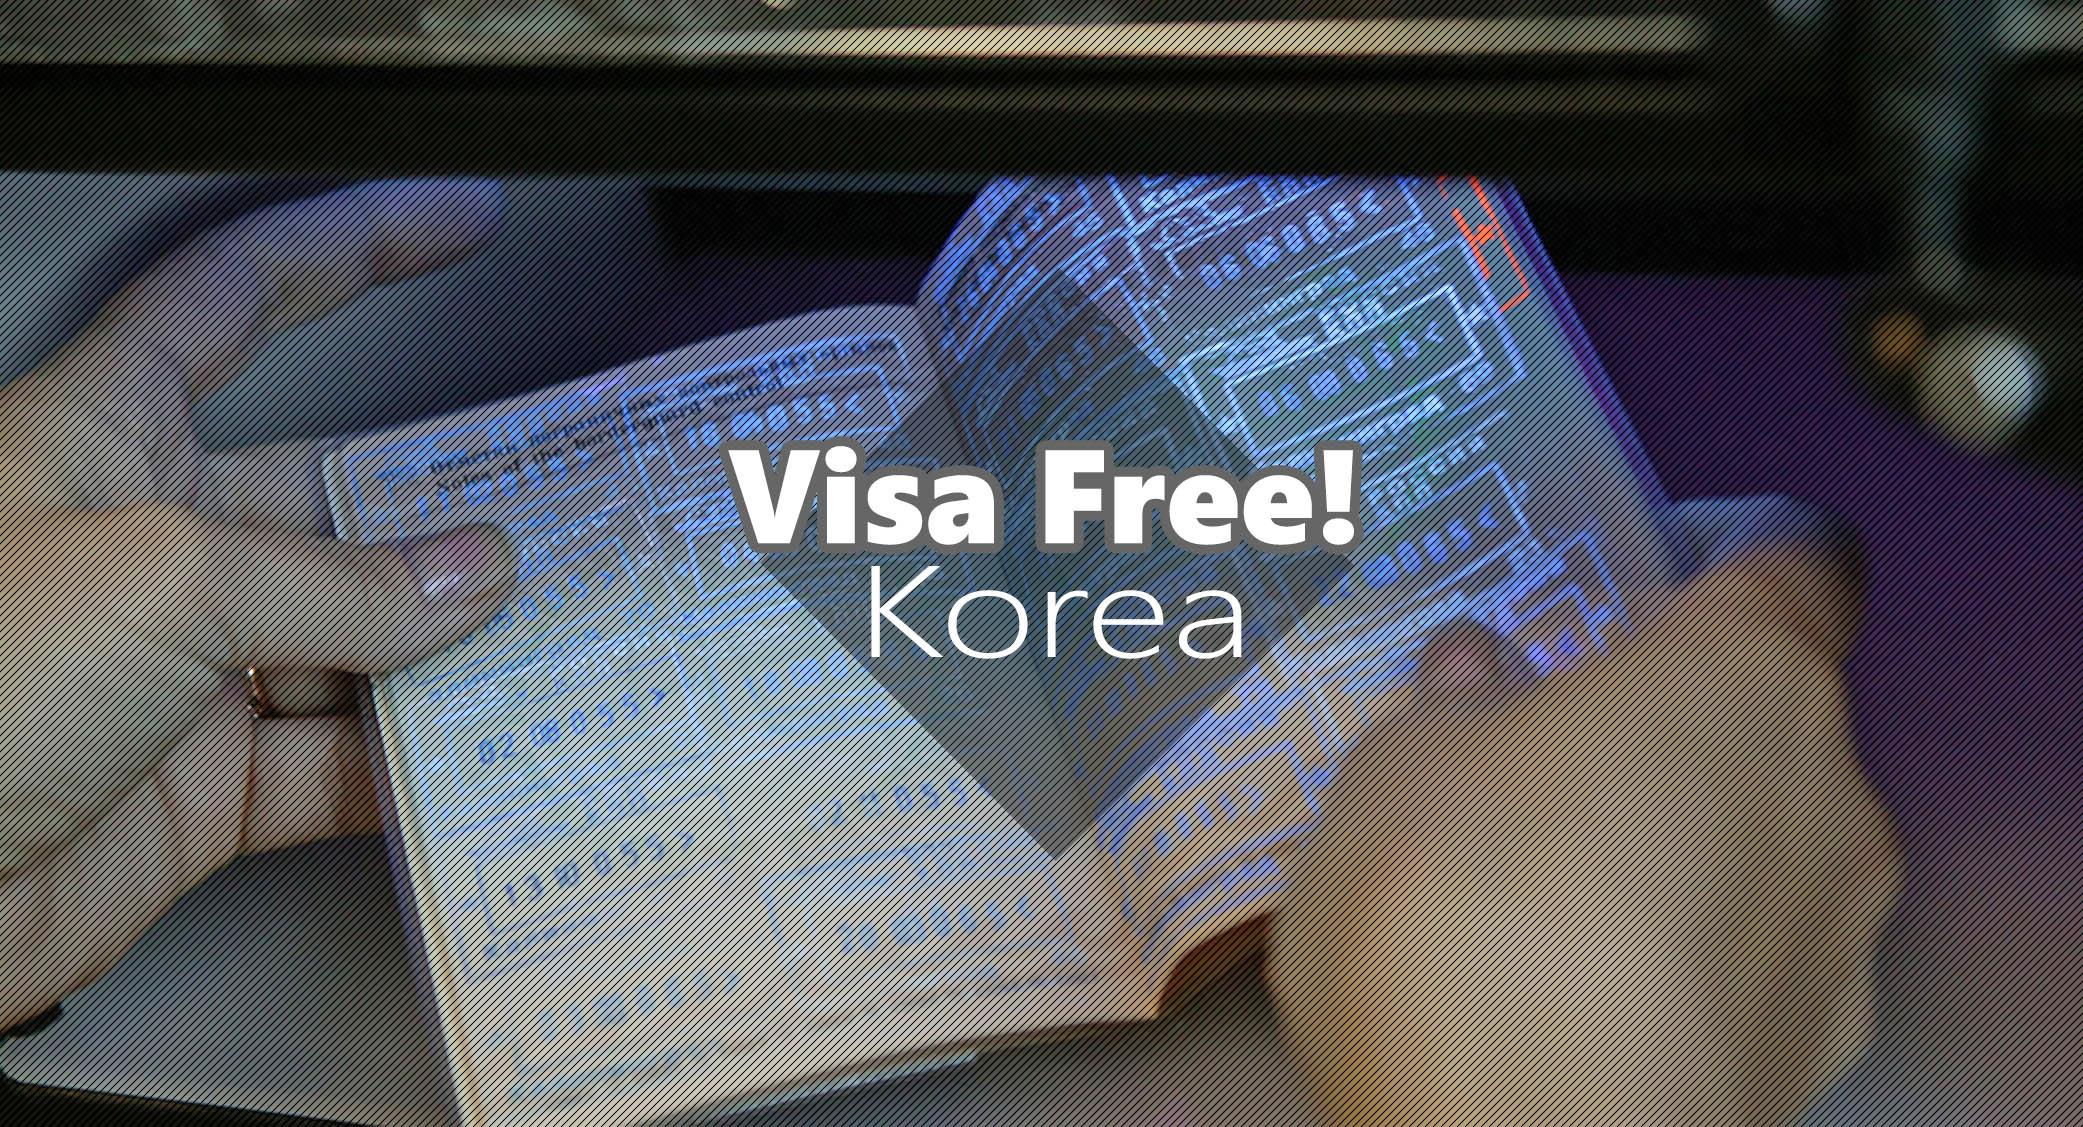 Korea Visa-free